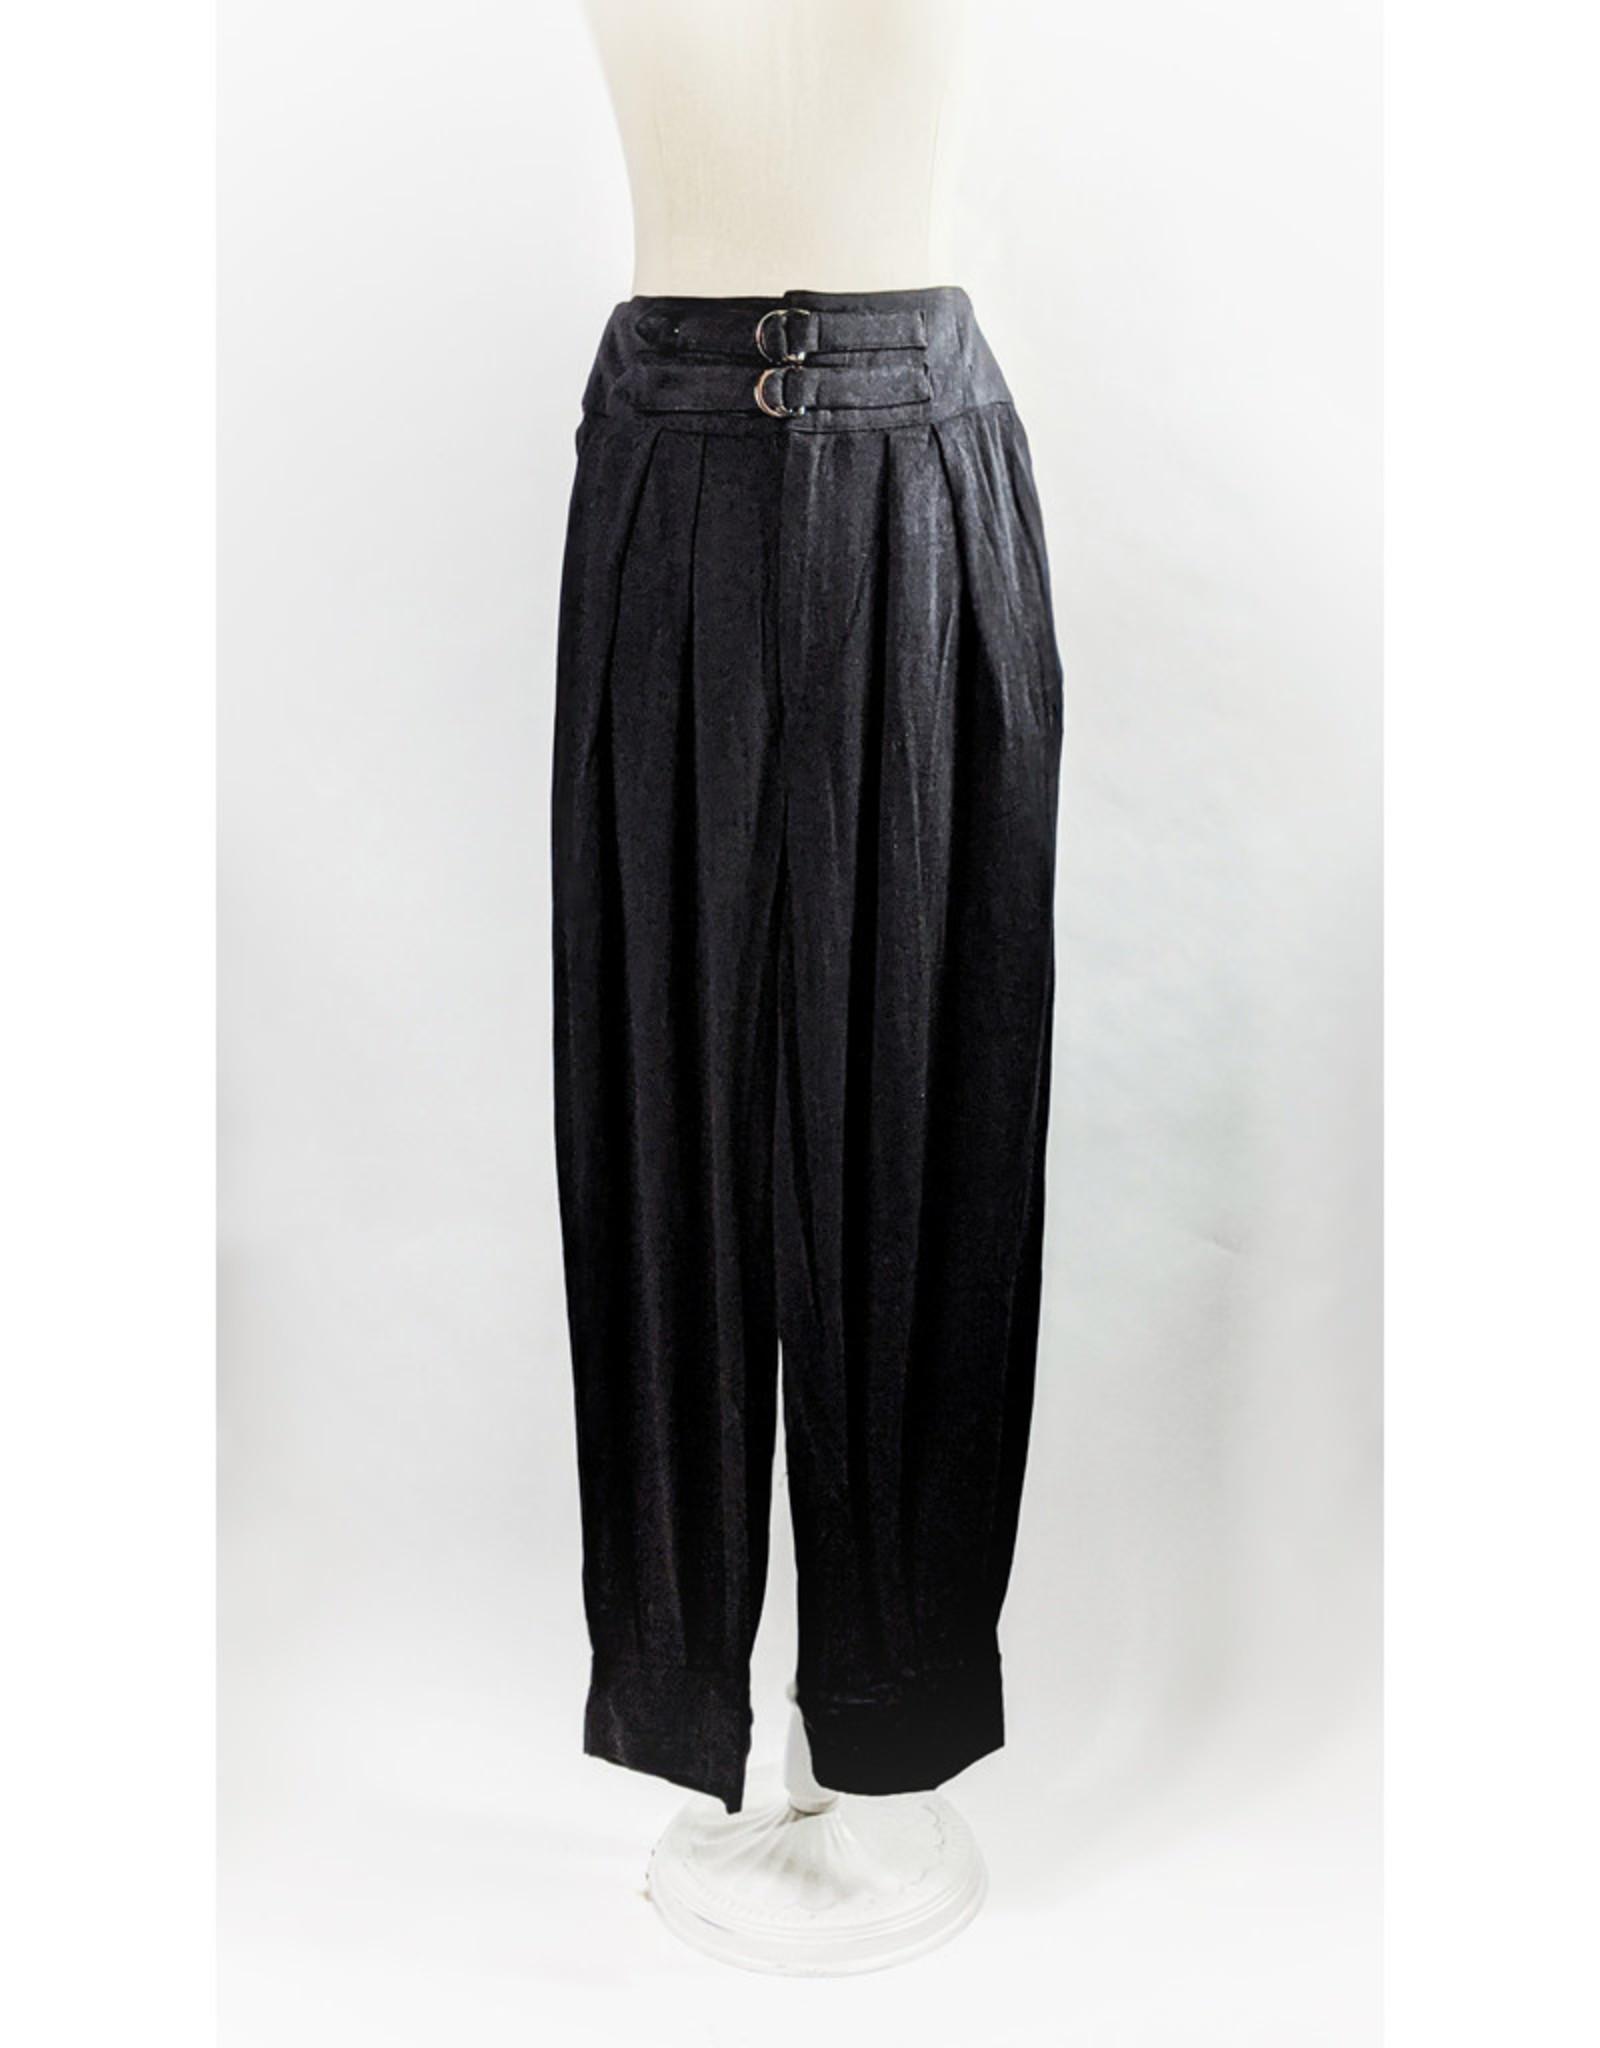 ILLA ILLA Black High Waist Pant w/Buckles